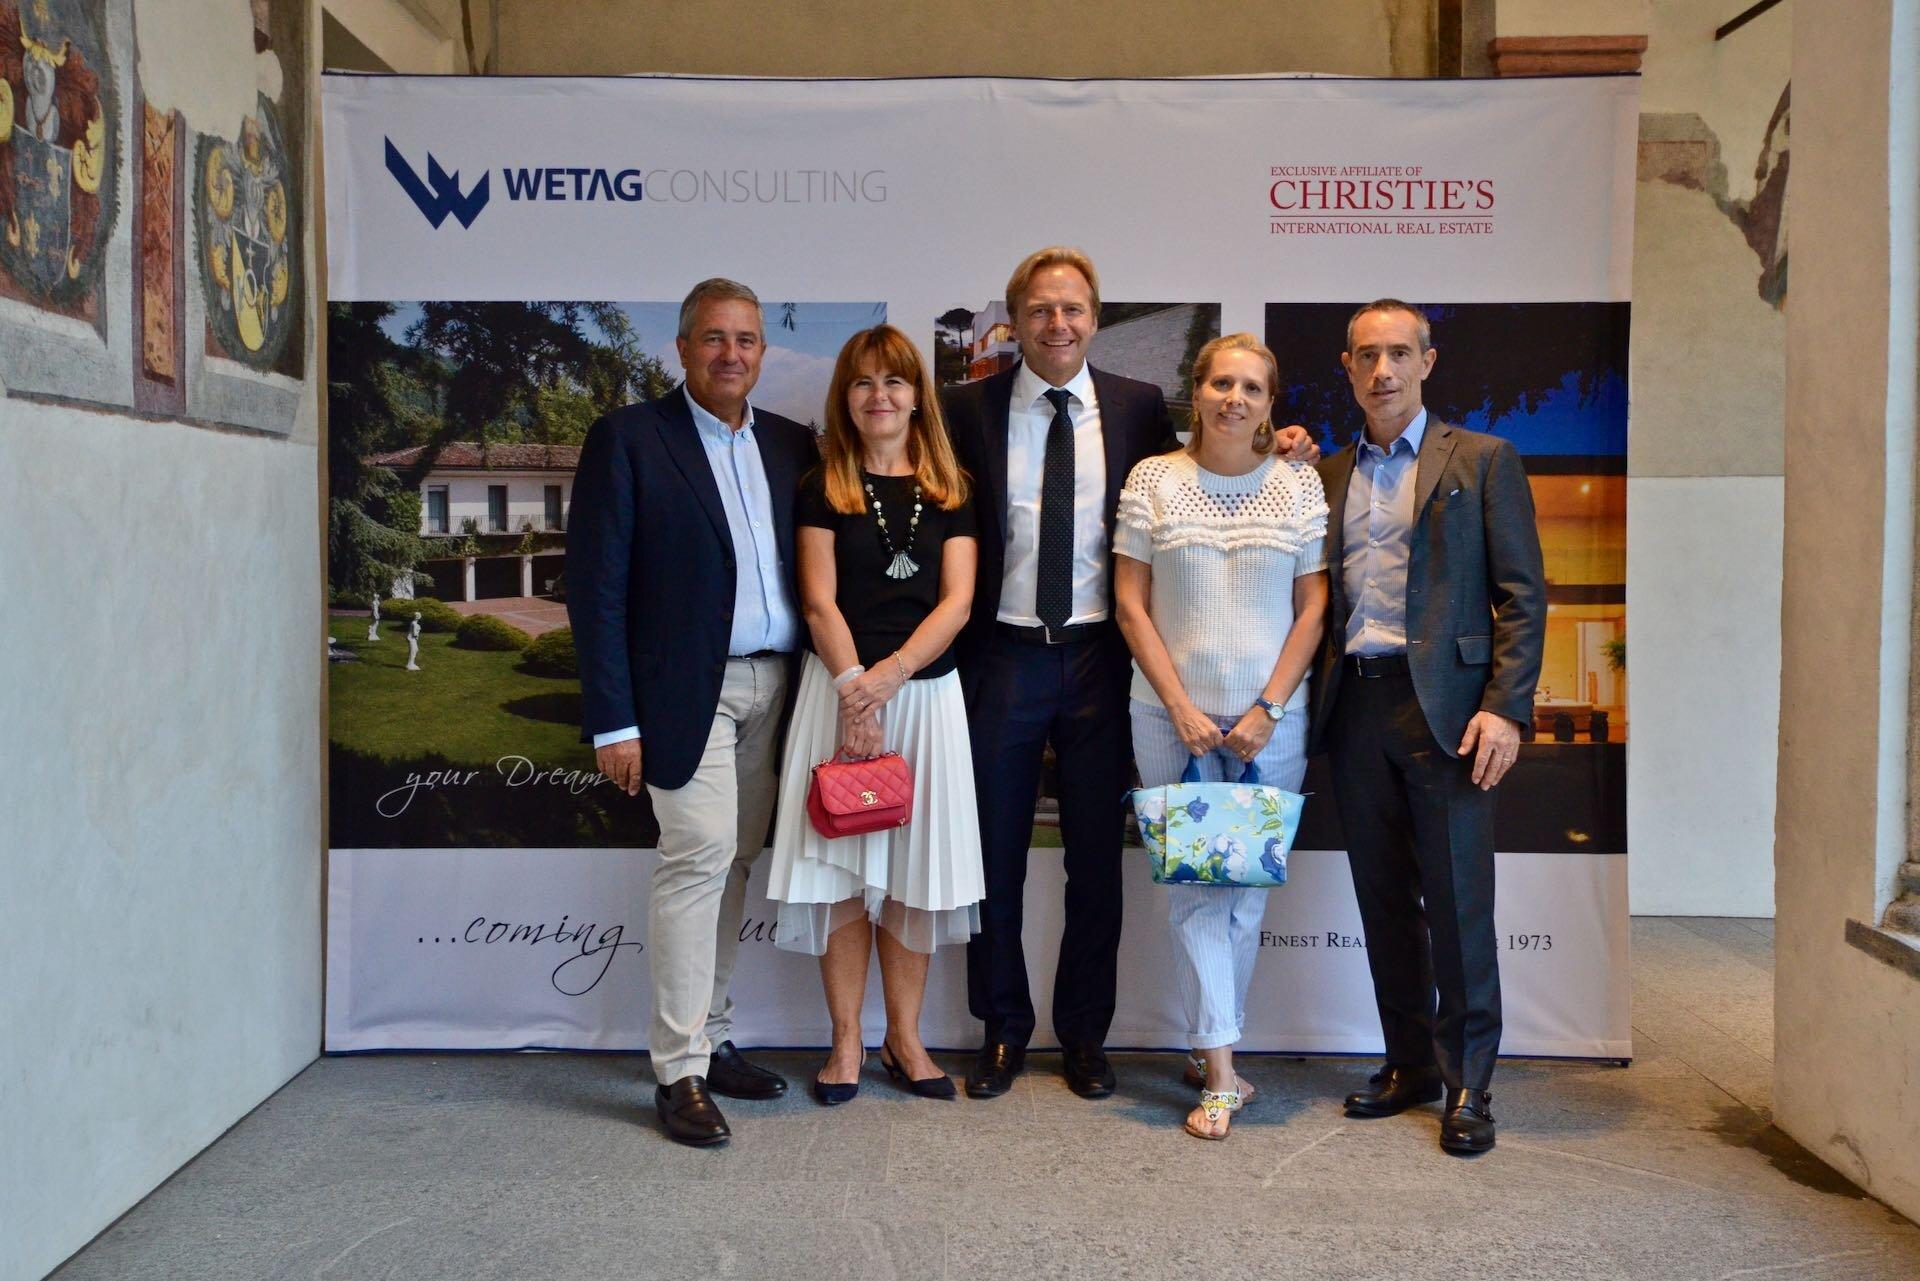 Christie's Event LAC Lugano 9-2019 - 18.jpg